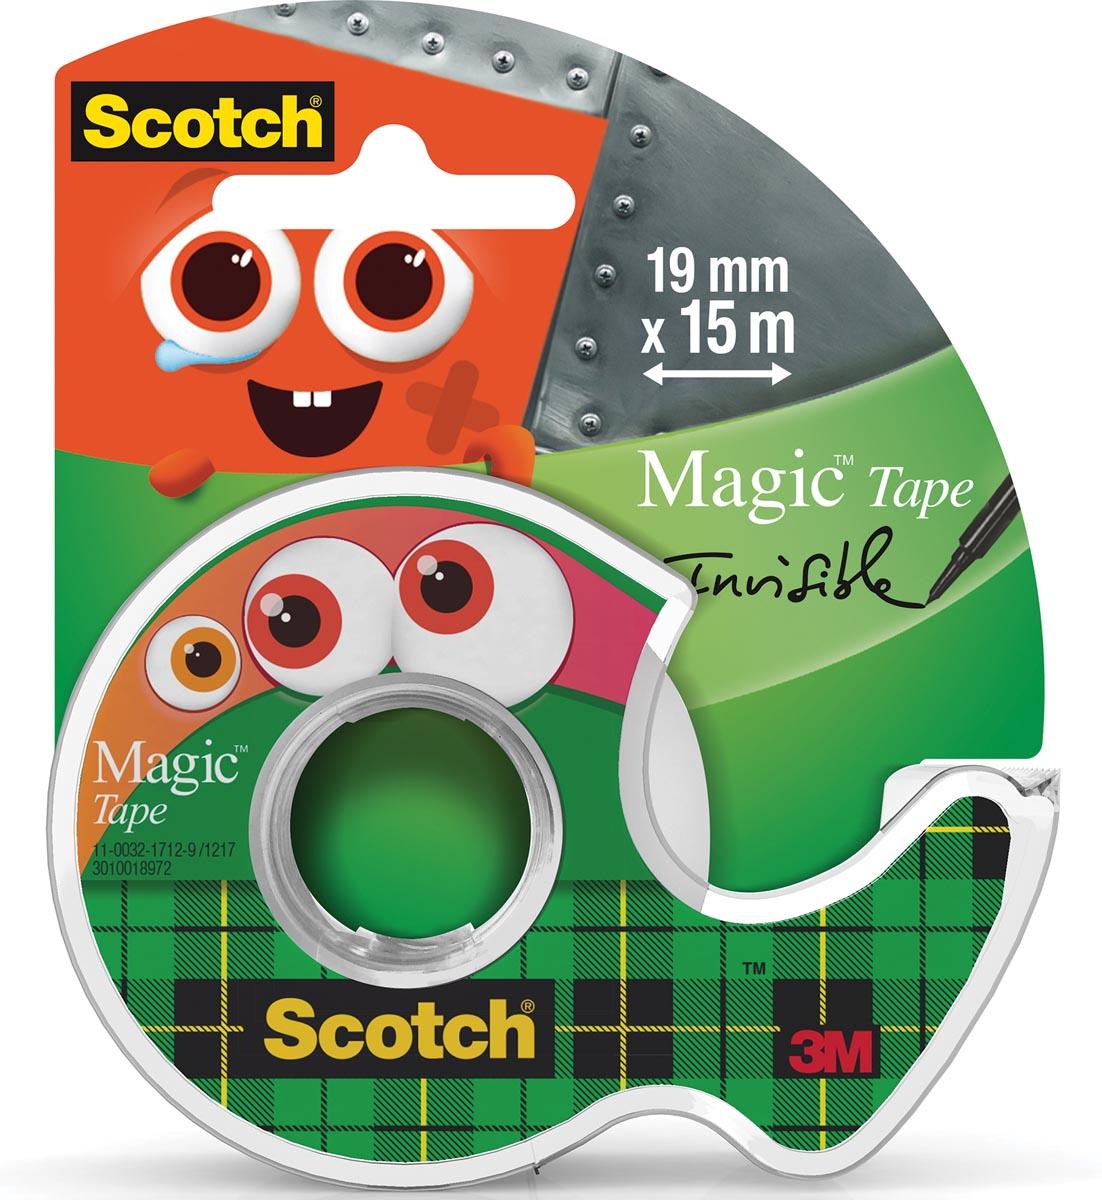 Scotch plakband Magic Monster Tape, ft 19 mm x 15 m, 2 clipstrips met 12 blisters per strip